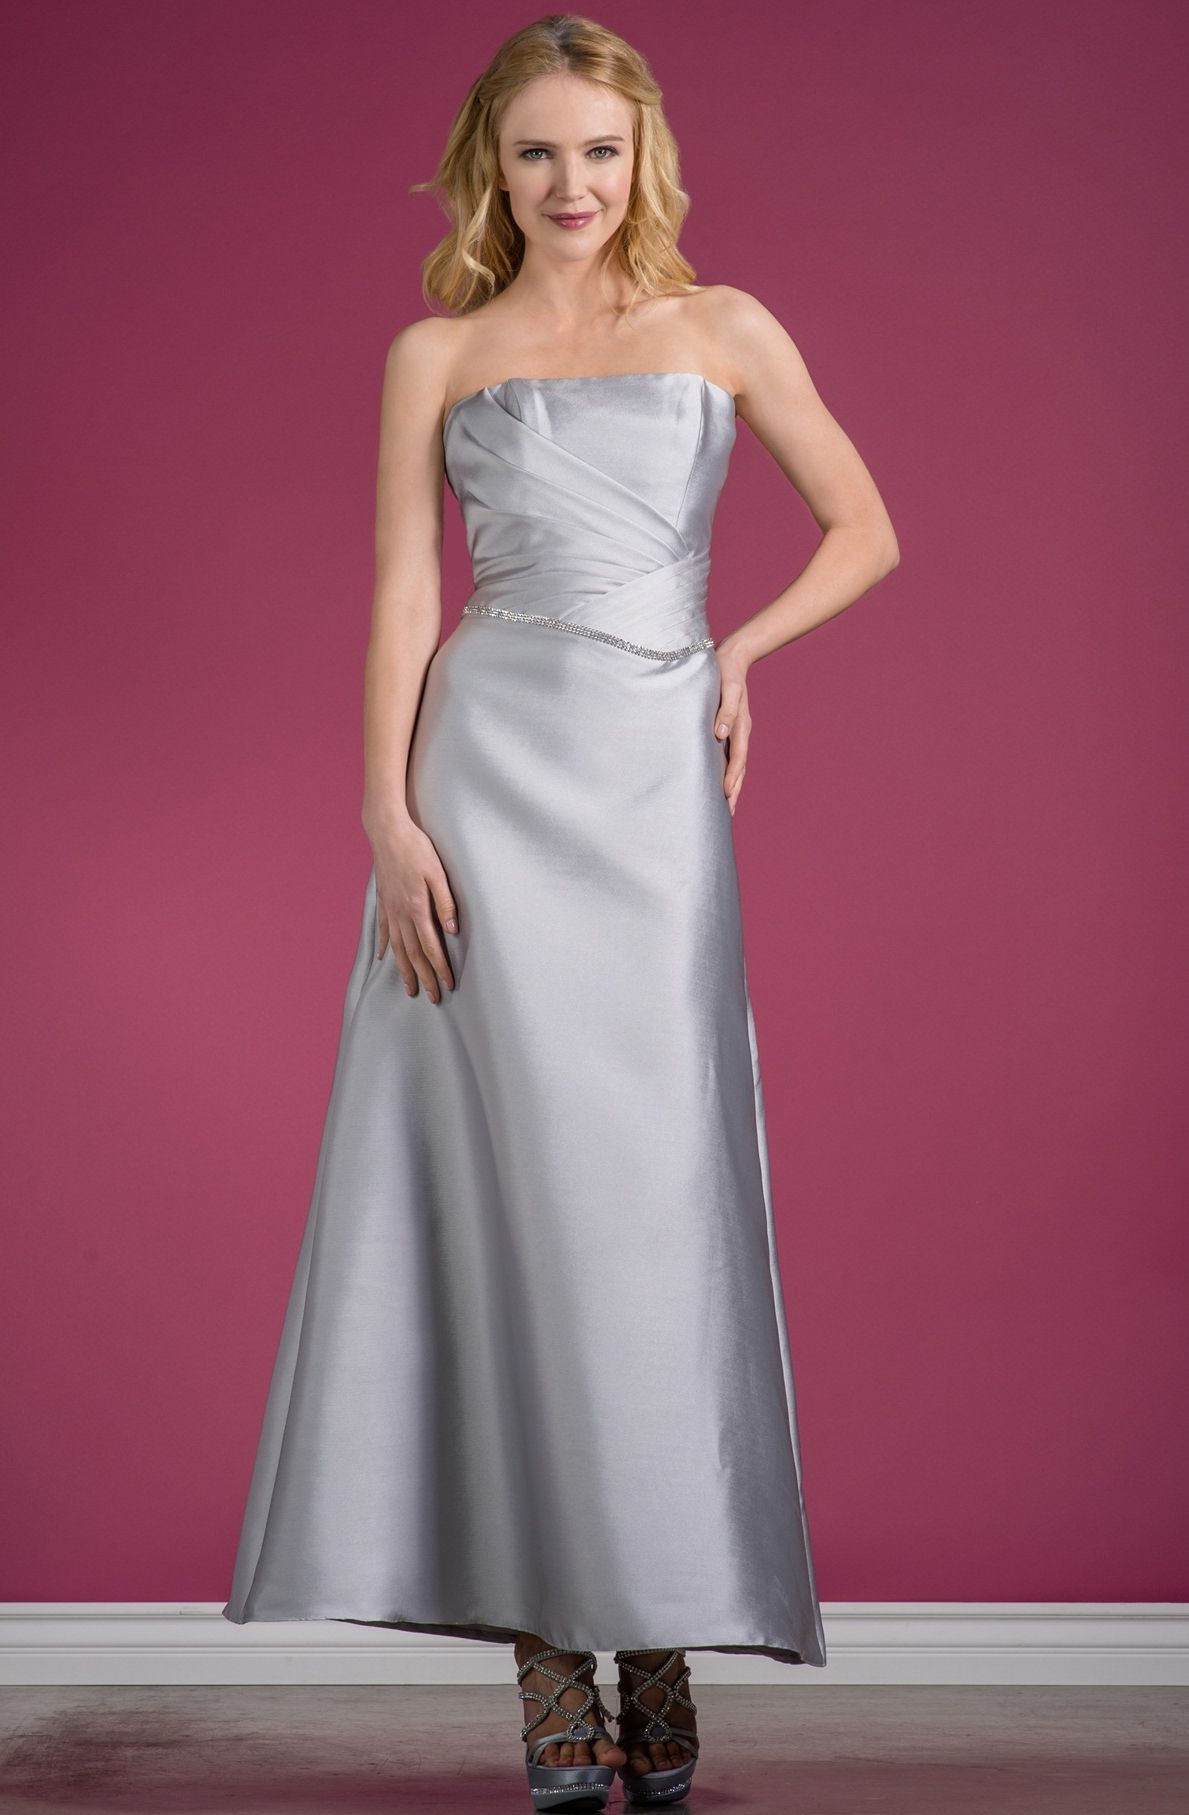 Elegant Taffeta Gown with Rhinestone Detail | Elegant Dresses ...